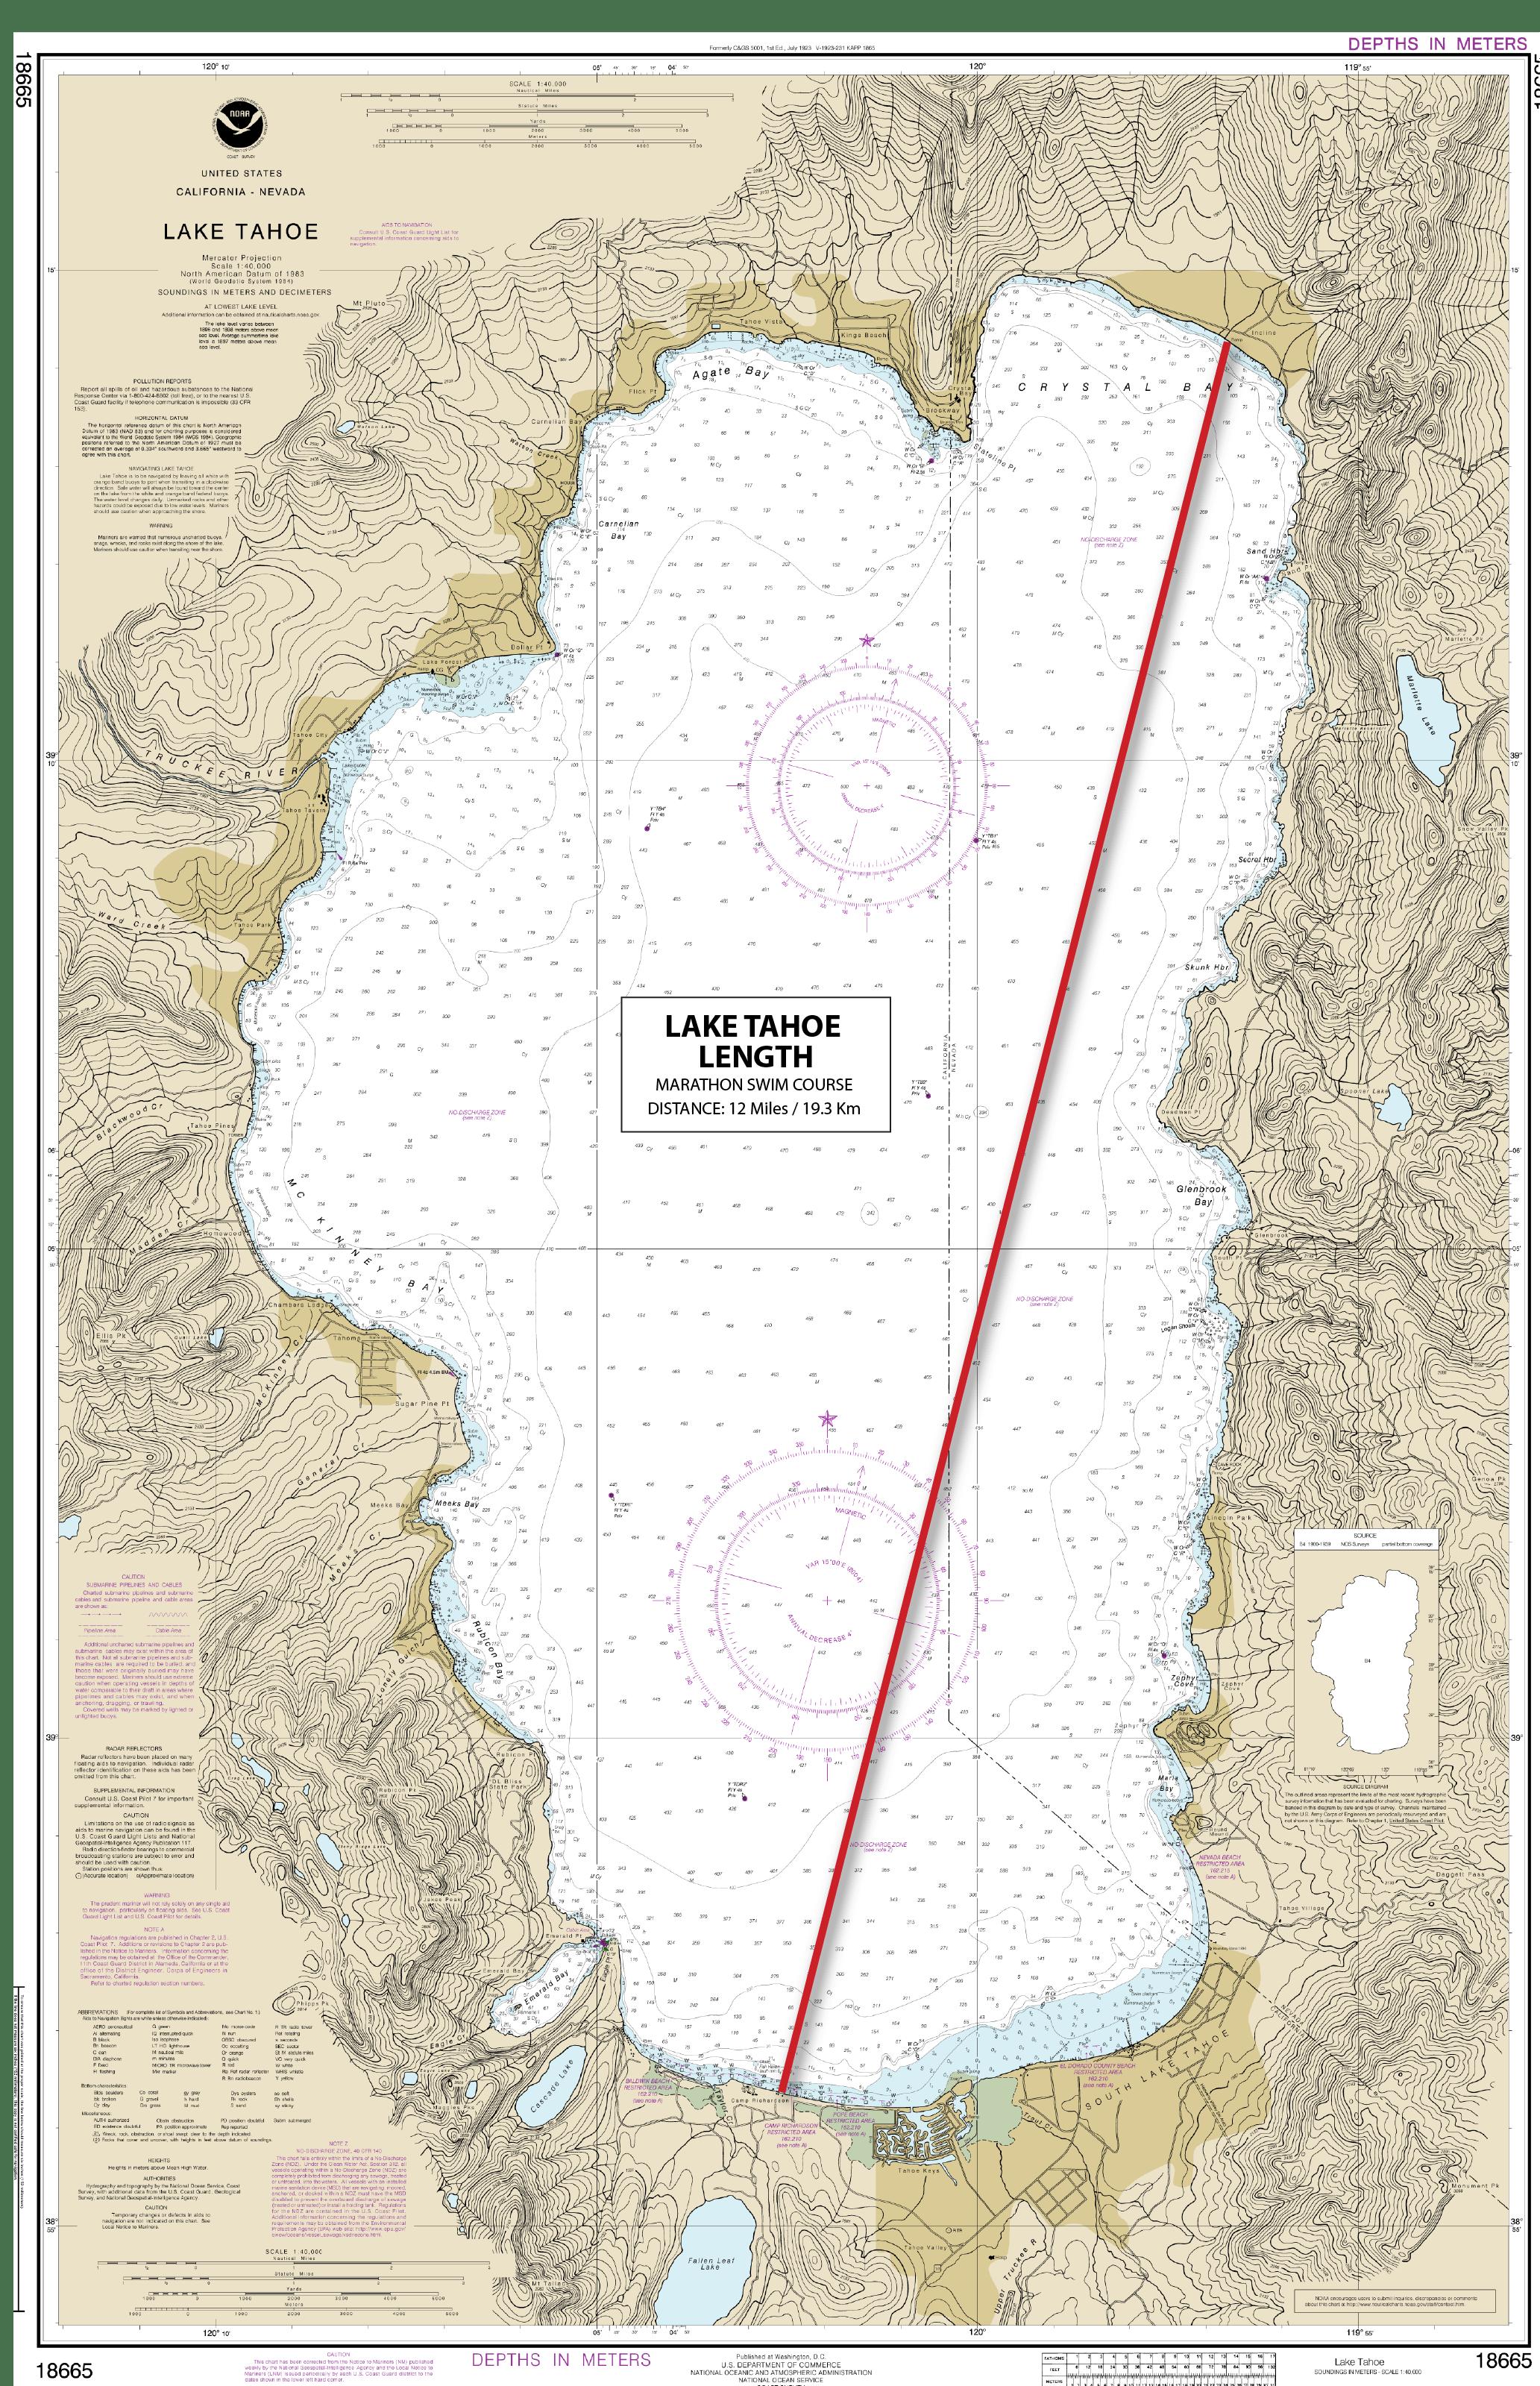 Lake Tahoe Length swim